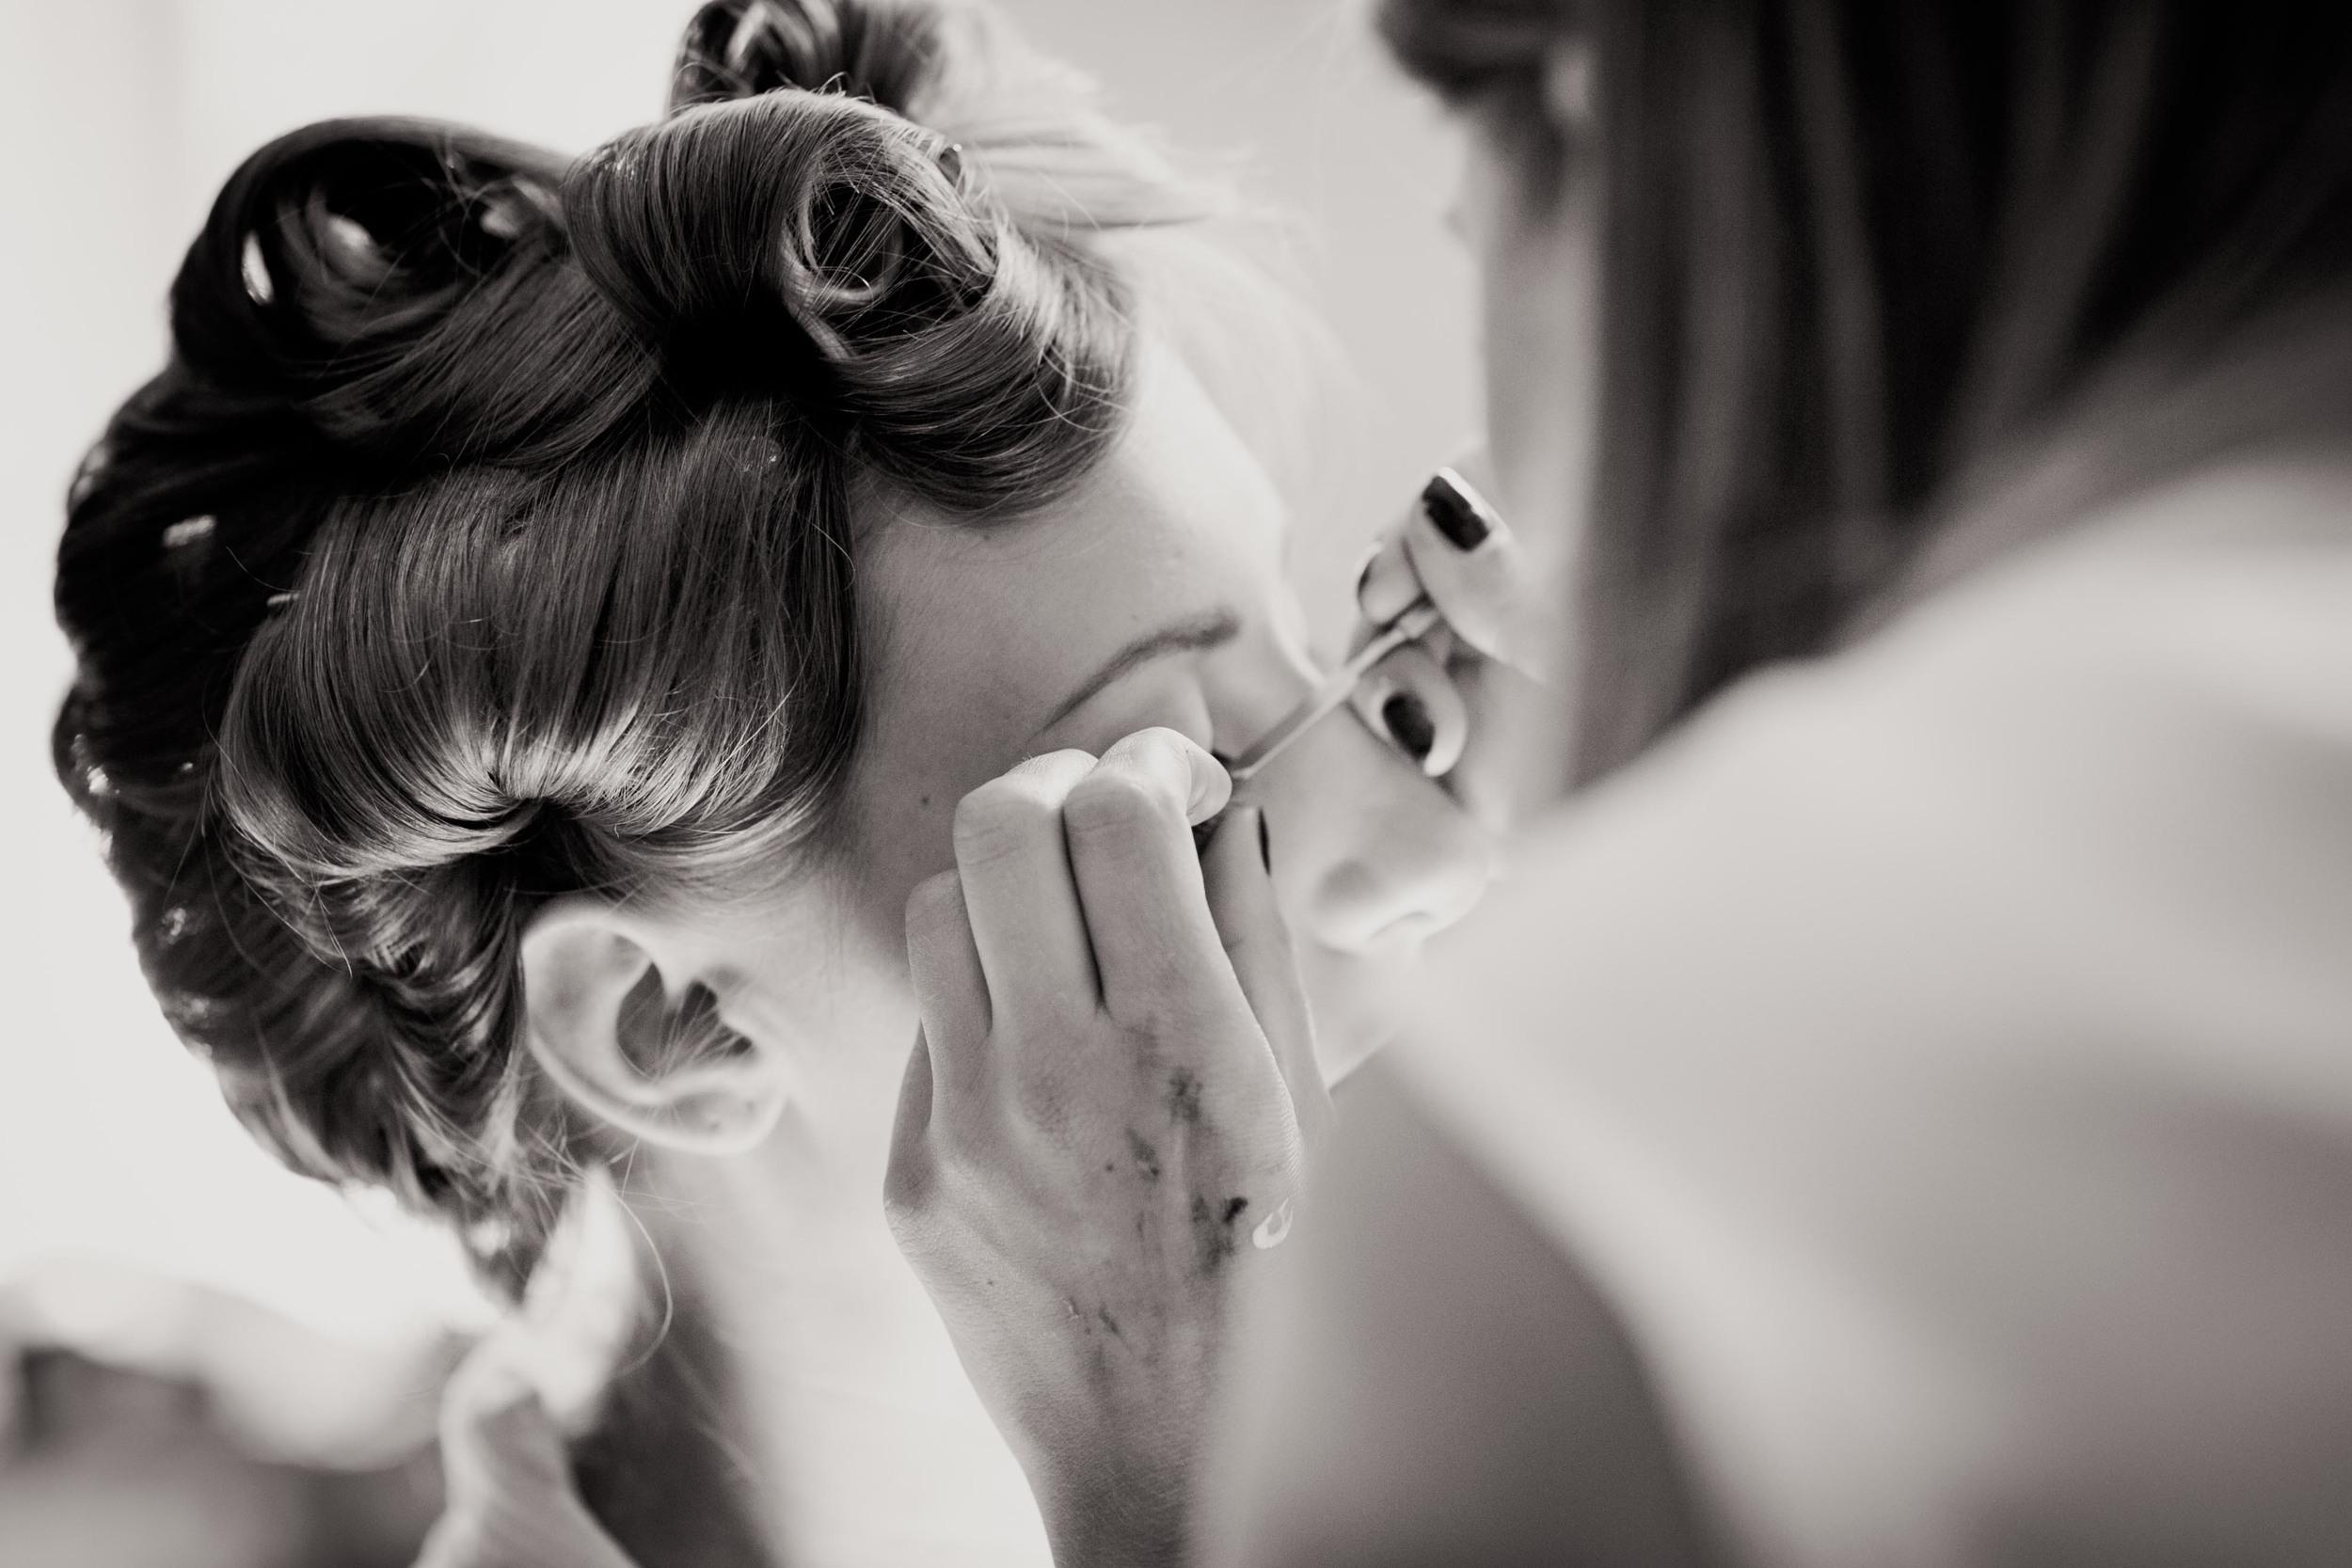 Fran Burrows Hochzeitsfotografie_Kulturgut Wrechen Hochzeit-6.jpg